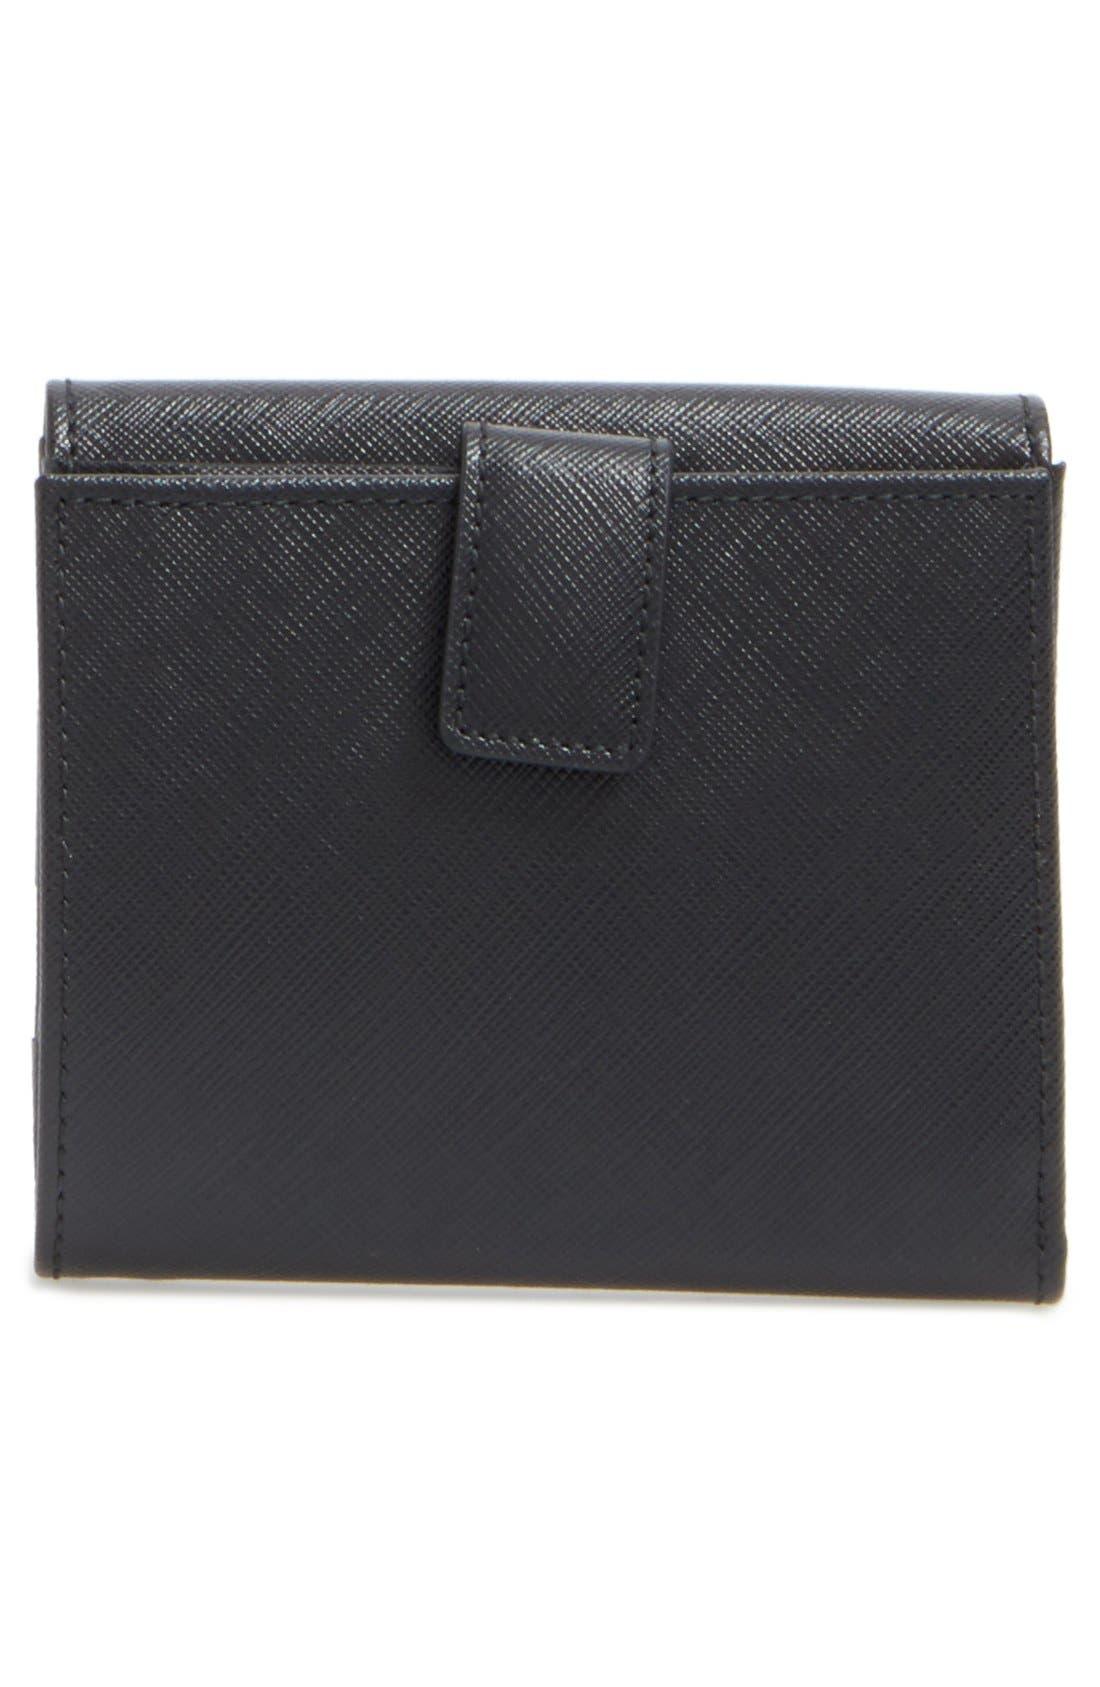 Alternate Image 3  - Salvatore Ferragamo Saffiano Calfskin Leather Wallet